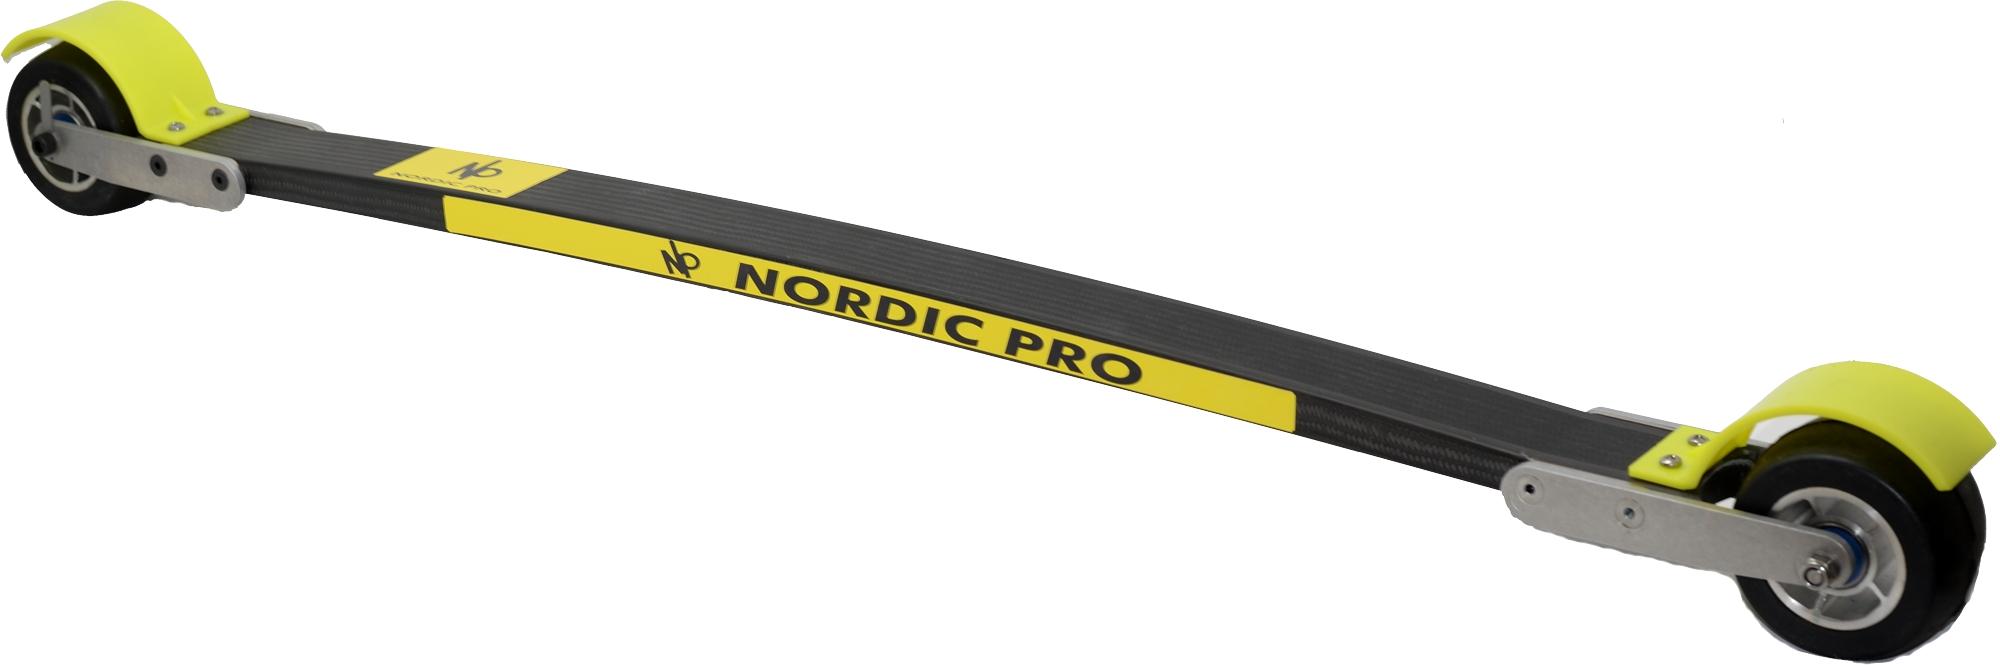 Nordic Pro Carbon Classic